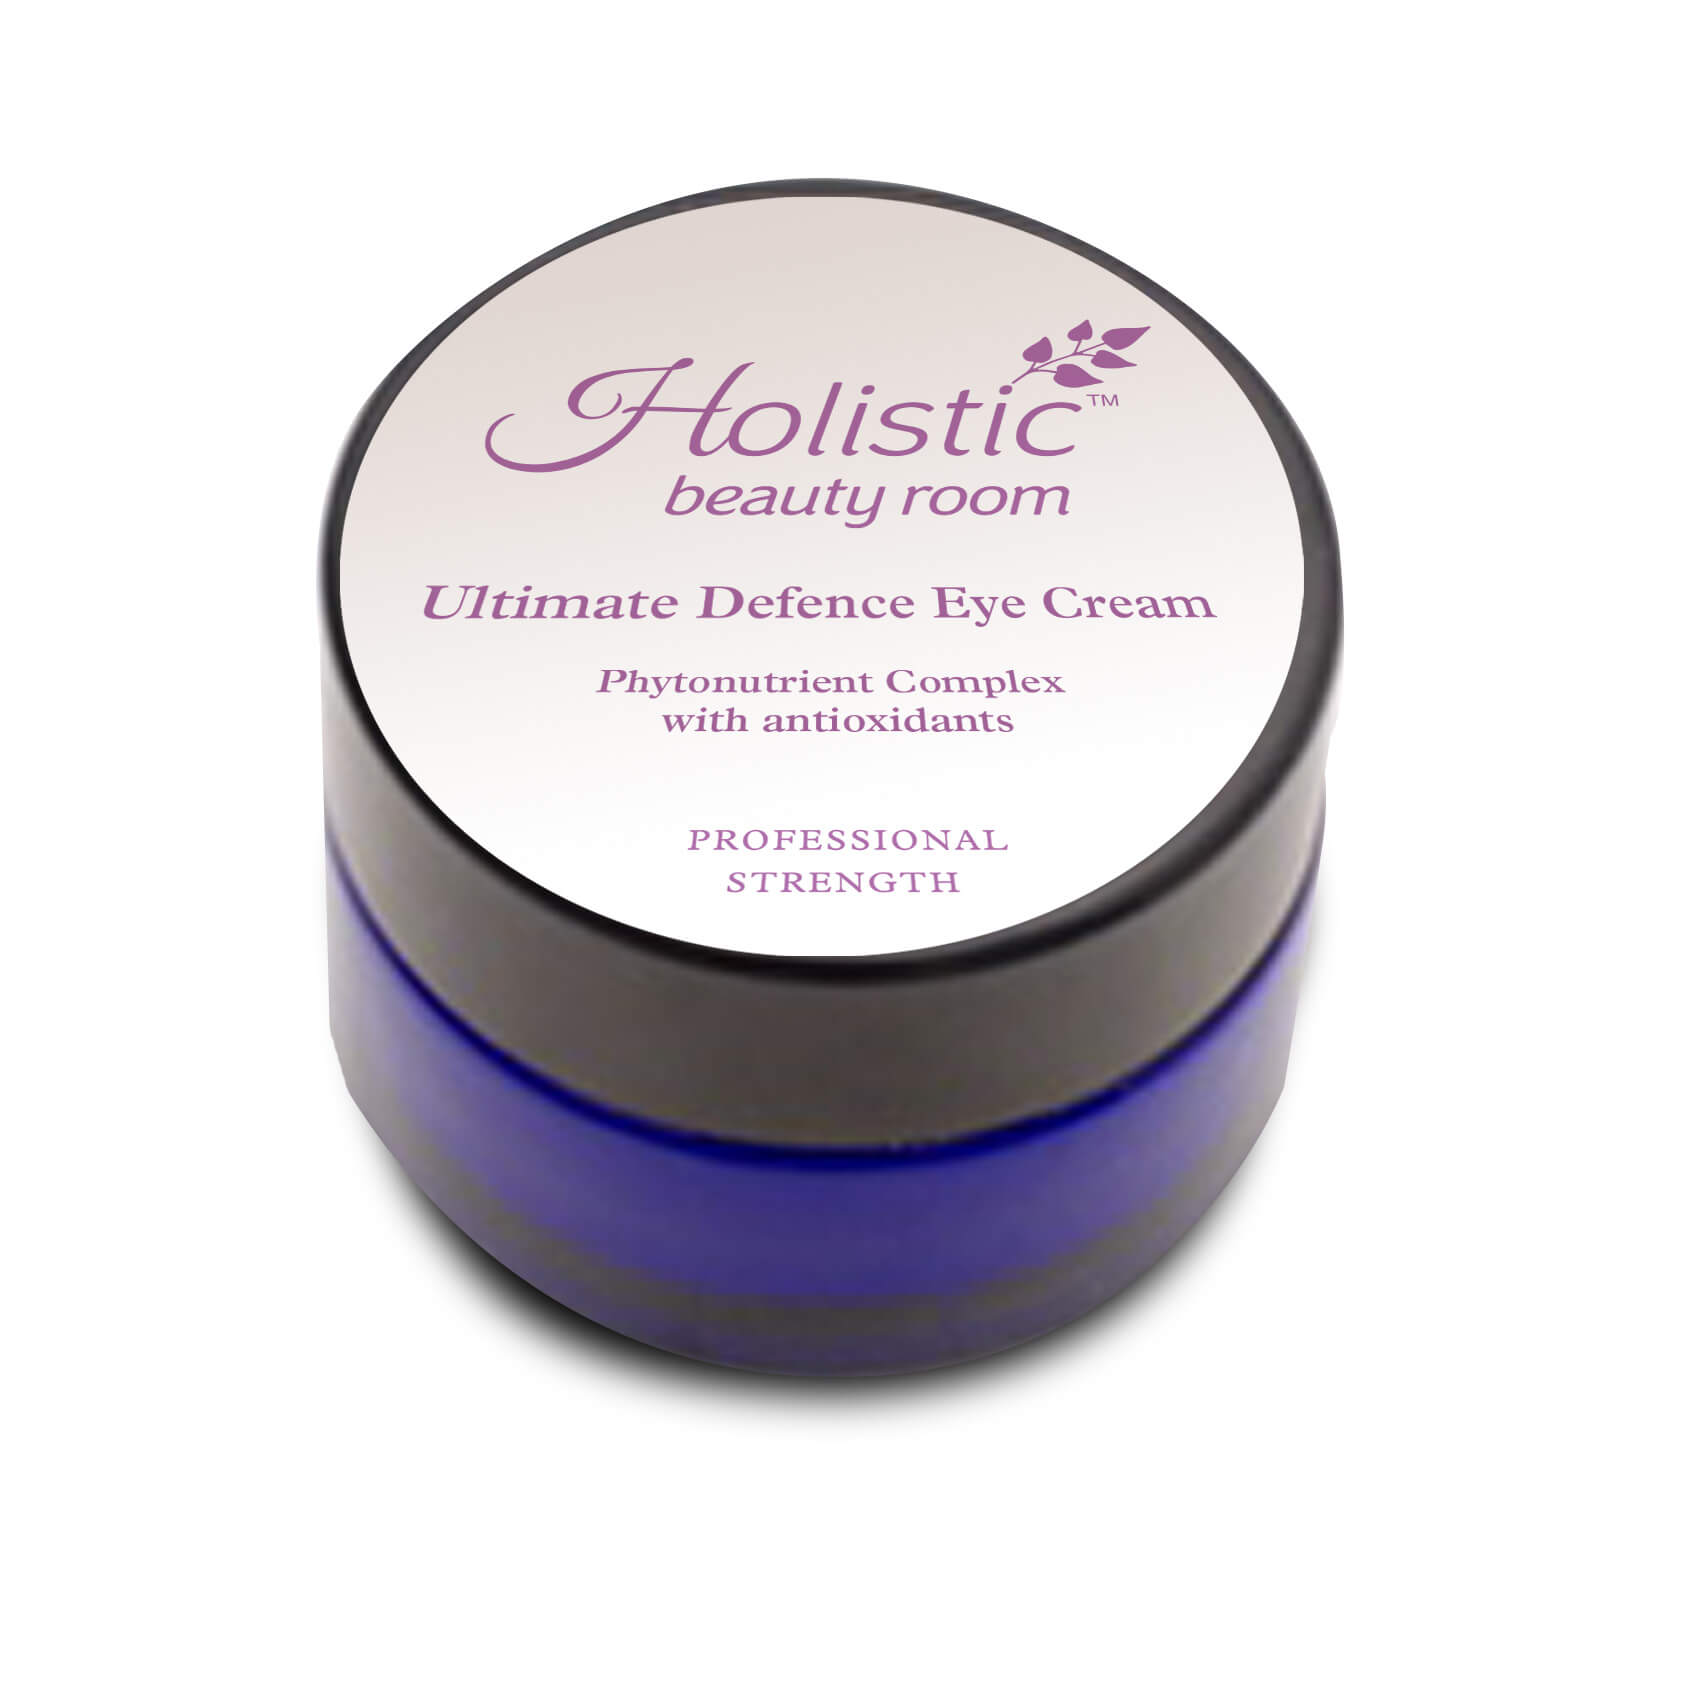 Ultimate Defence Eye Cream